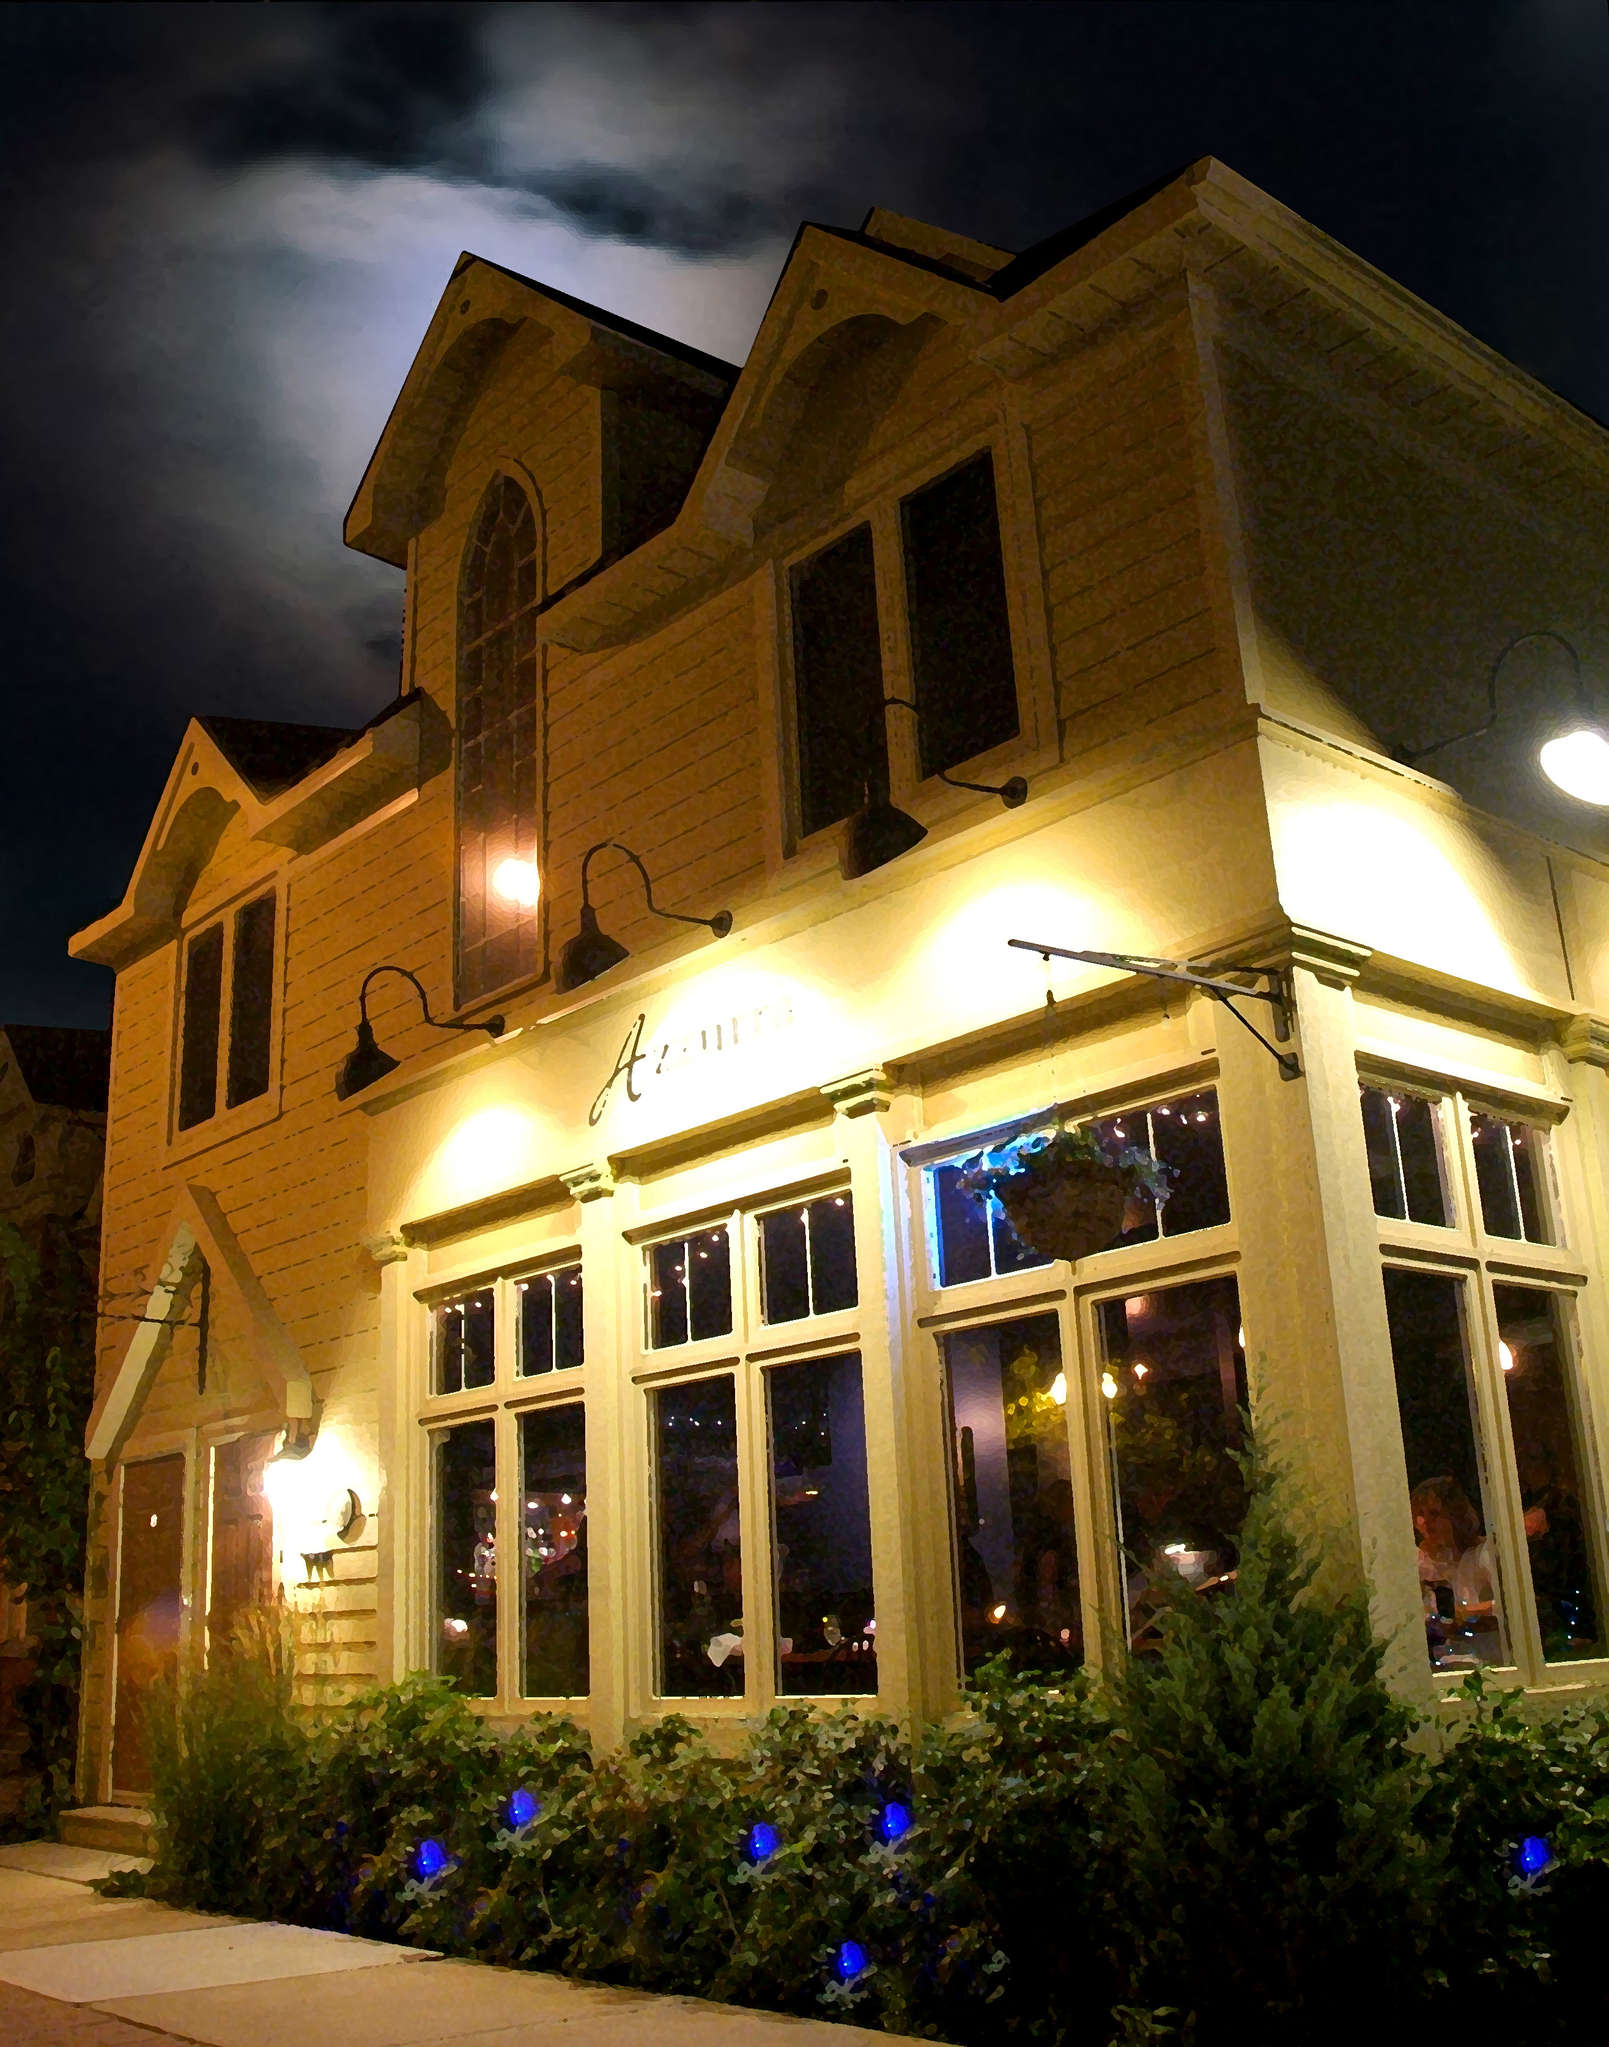 Azzurra - 100 Pine Street, Collingwood - (705) 445-7771 -*****